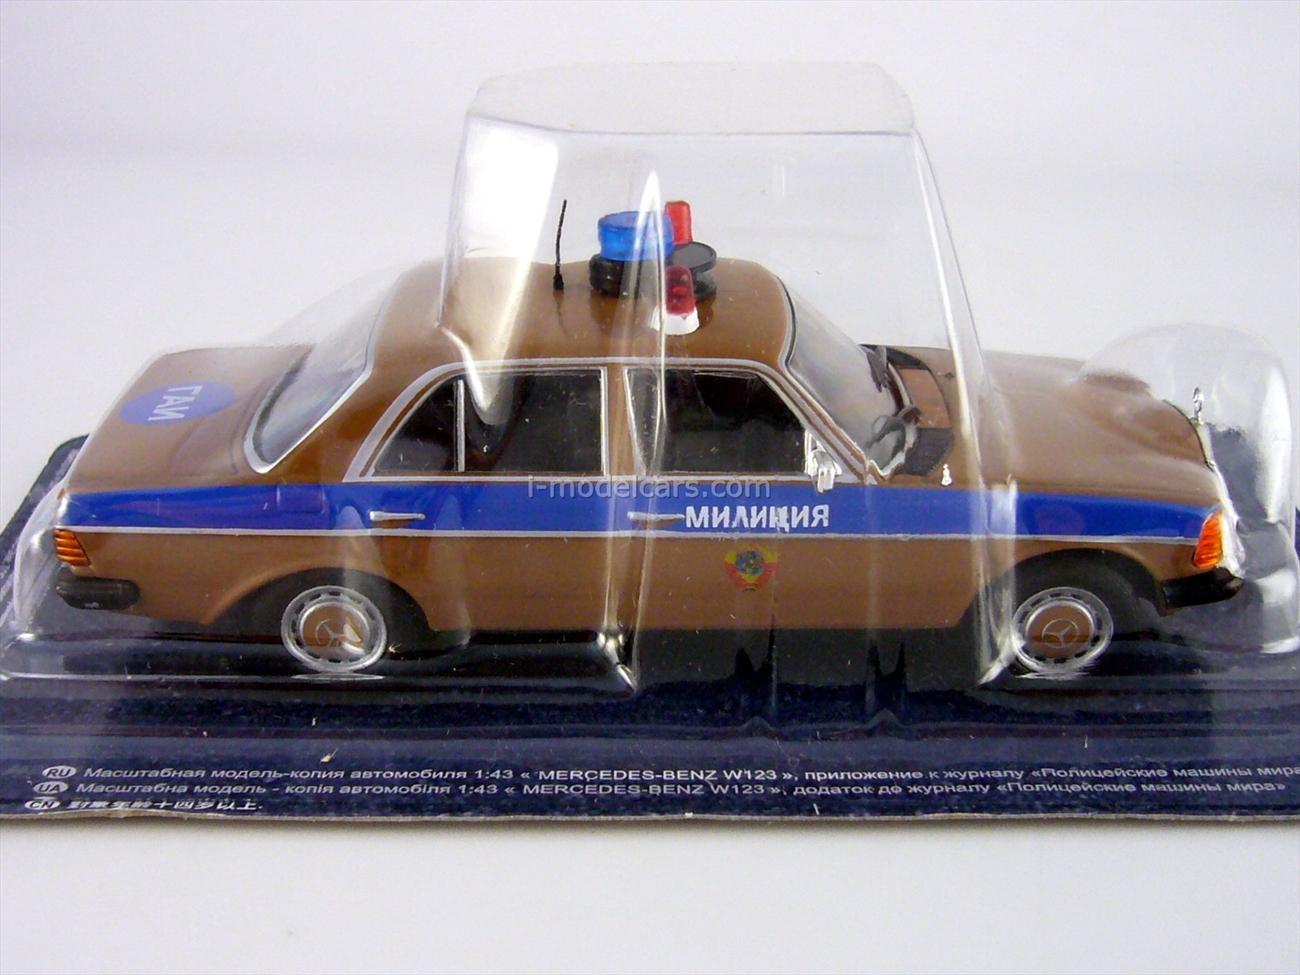 Mercedes-Benz W123 GAI Police Moscow USSR 1:43 DeAgostini World's Police Car #59